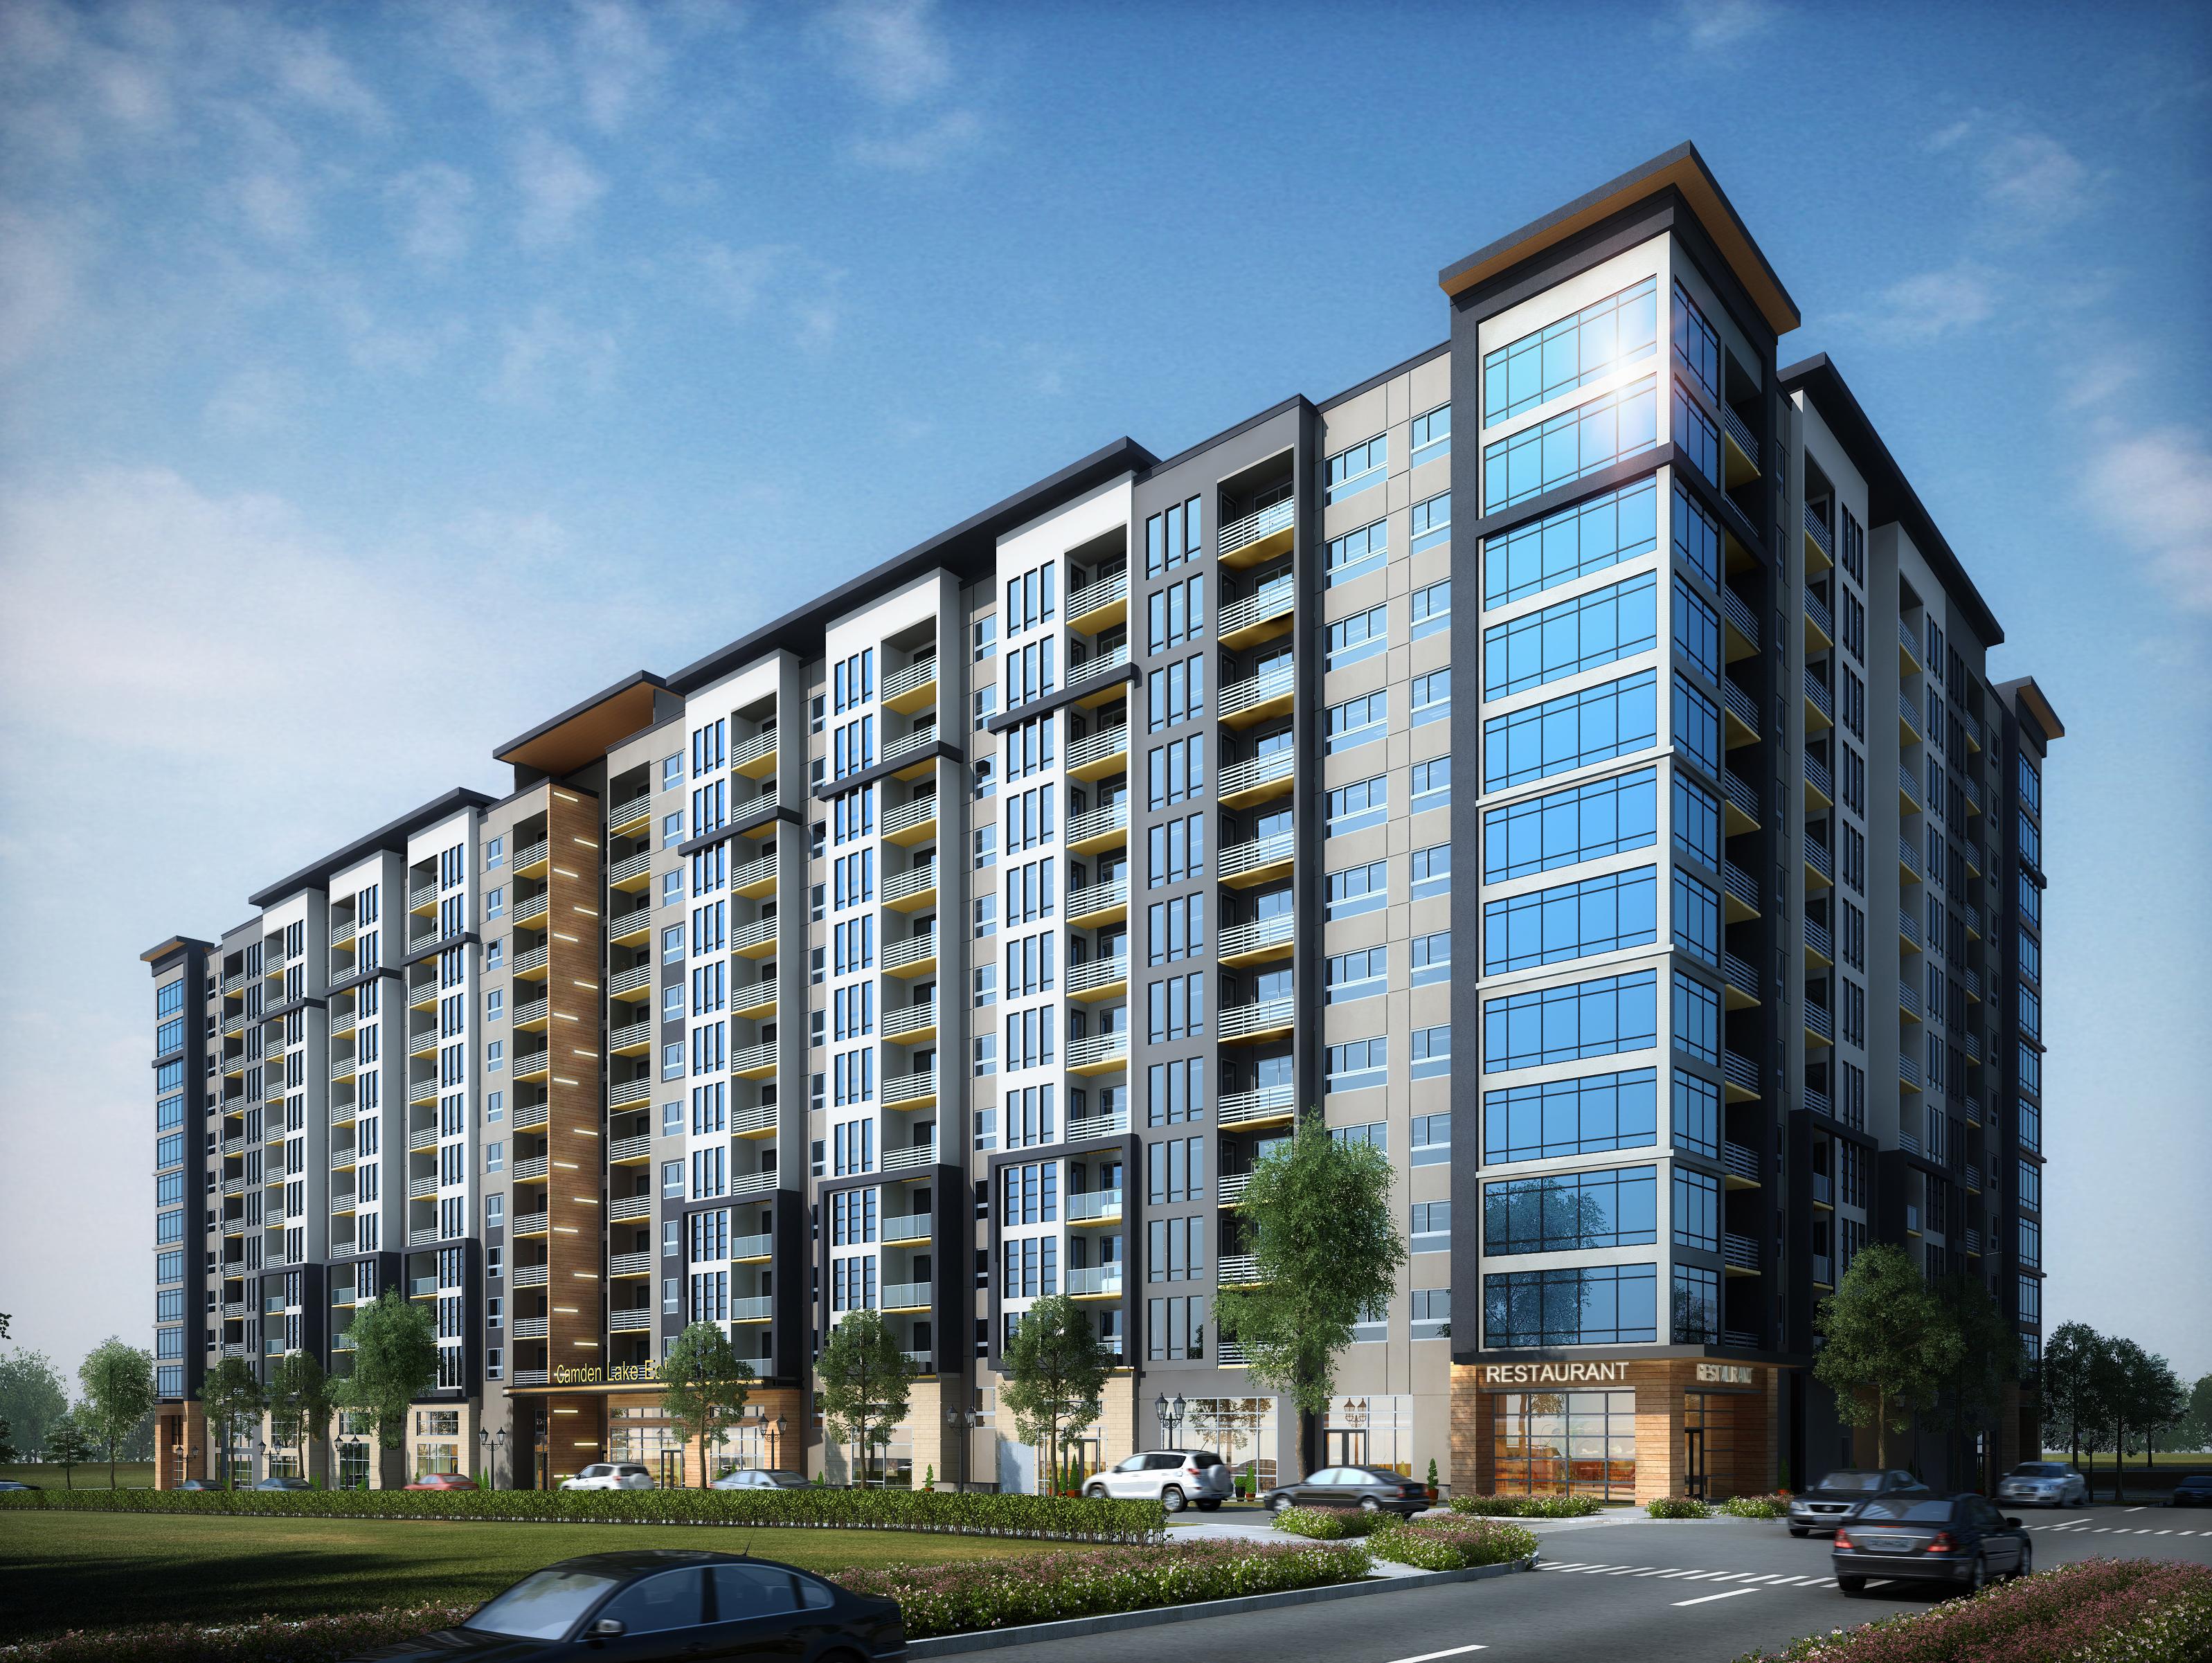 camden-lake-eola-new-apartments-downtown-orlando-florida